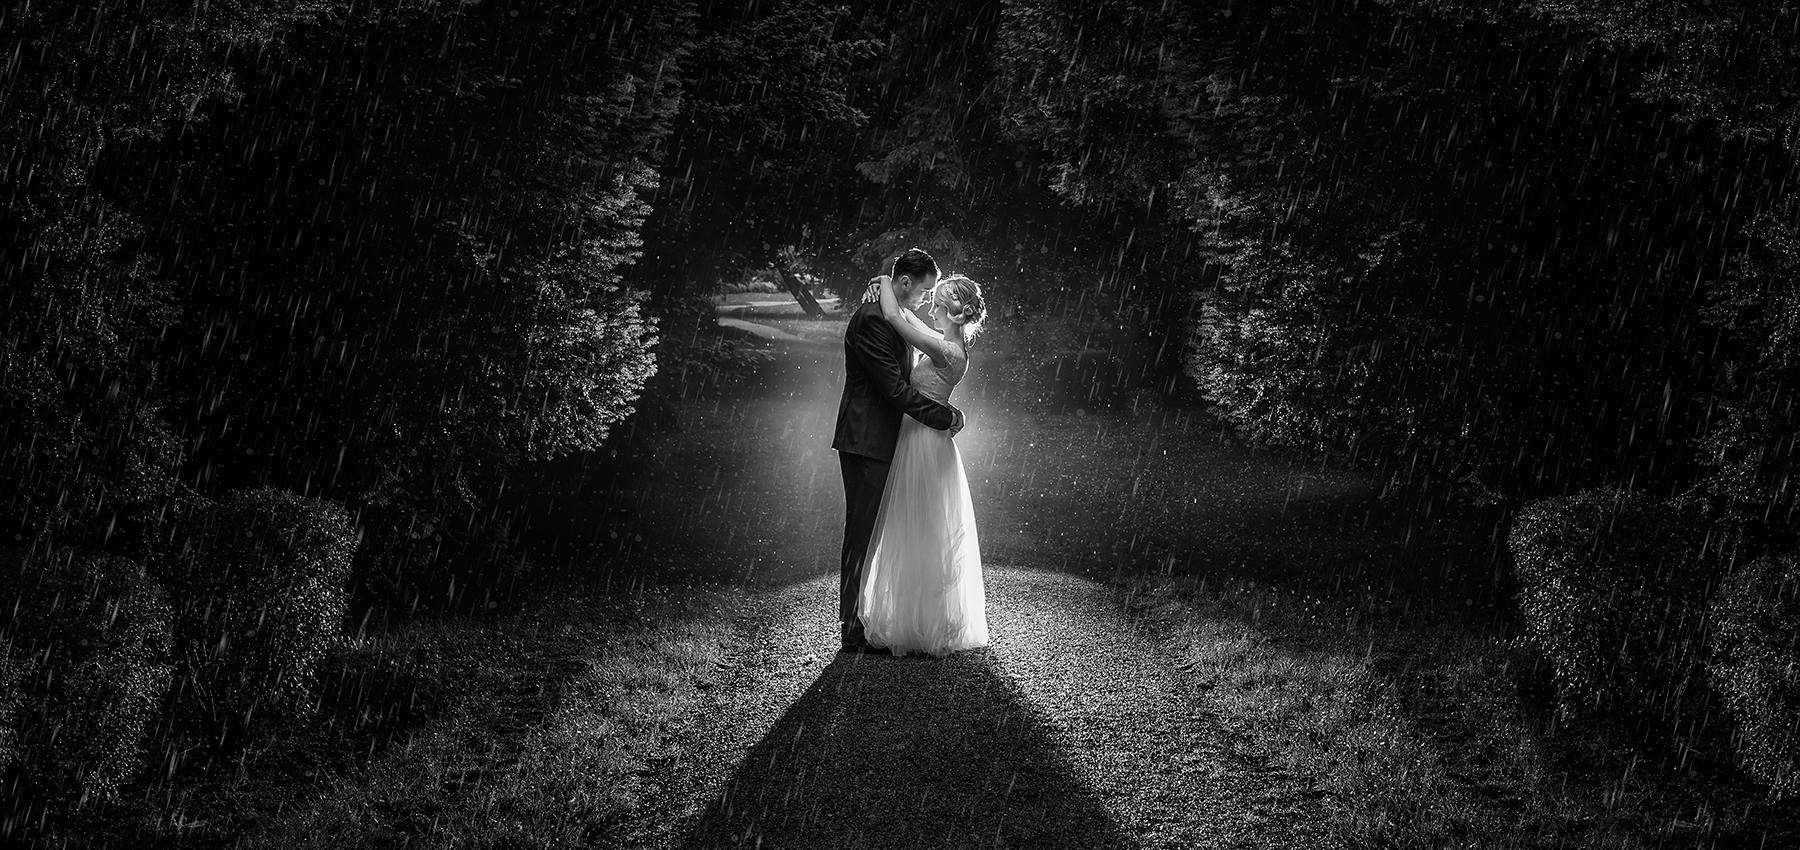 Exclusive One on One Wedding Photography Workshop Damjan Fiket